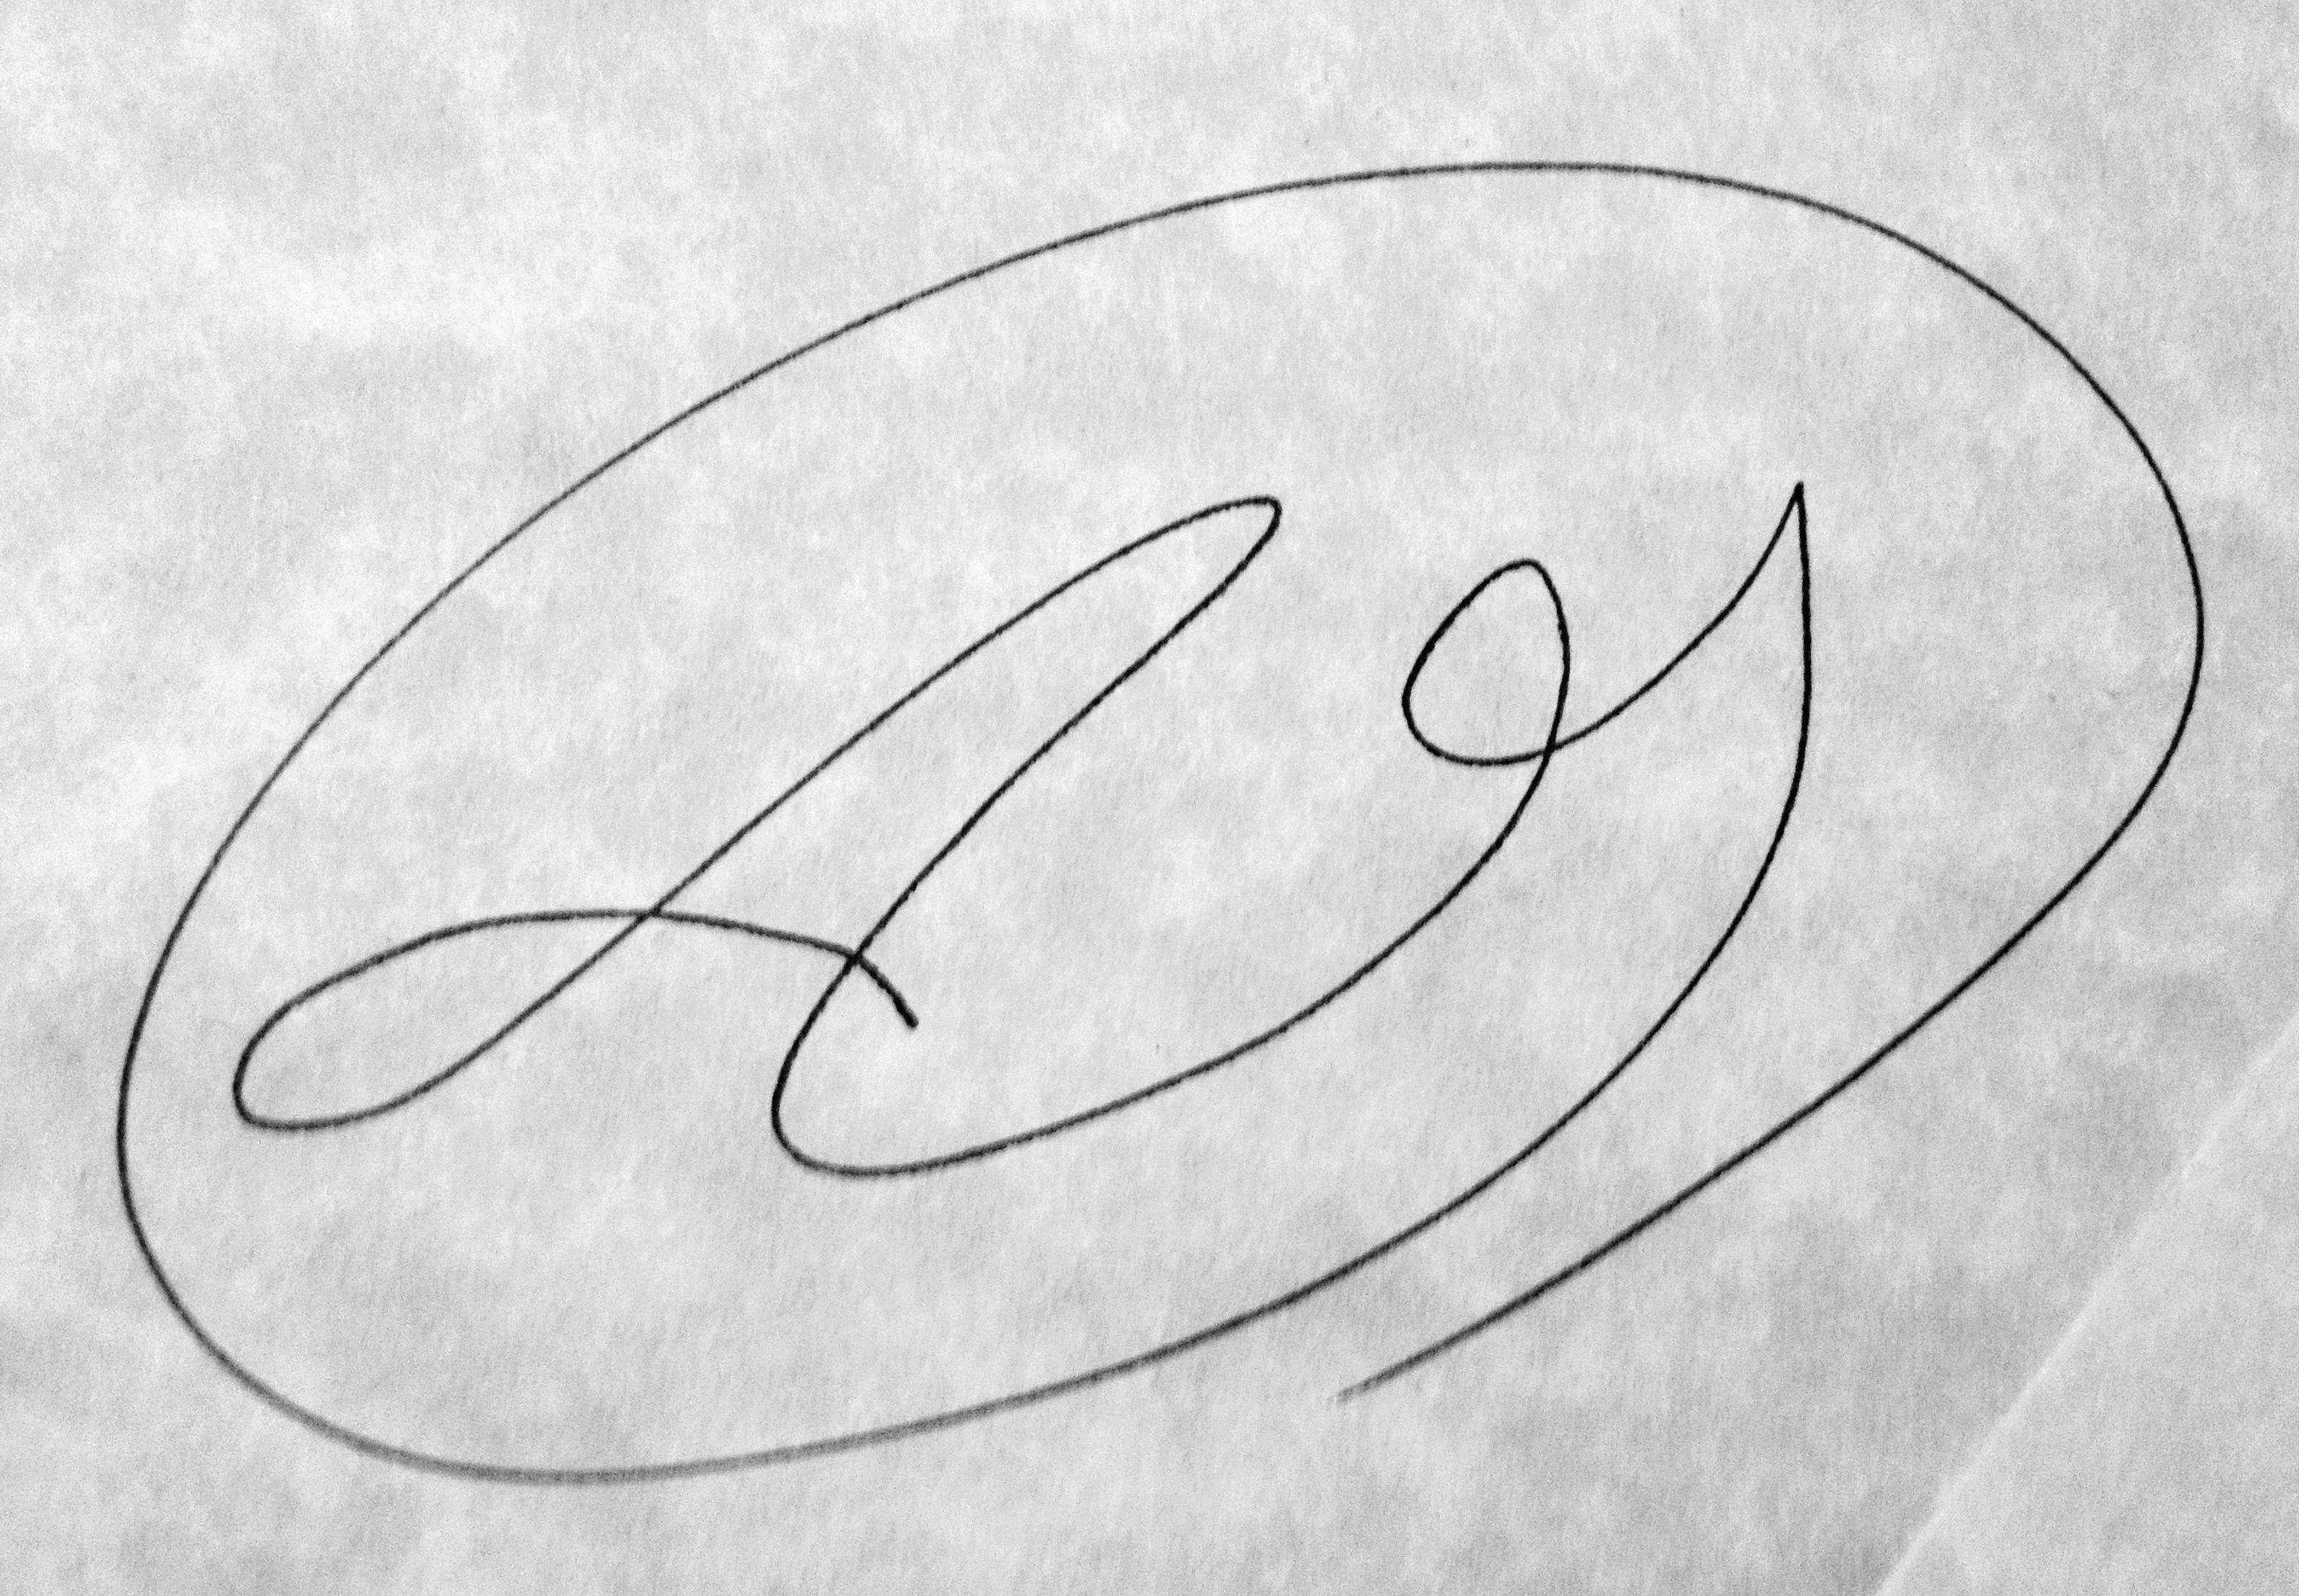 Alexandra Genest's Signature